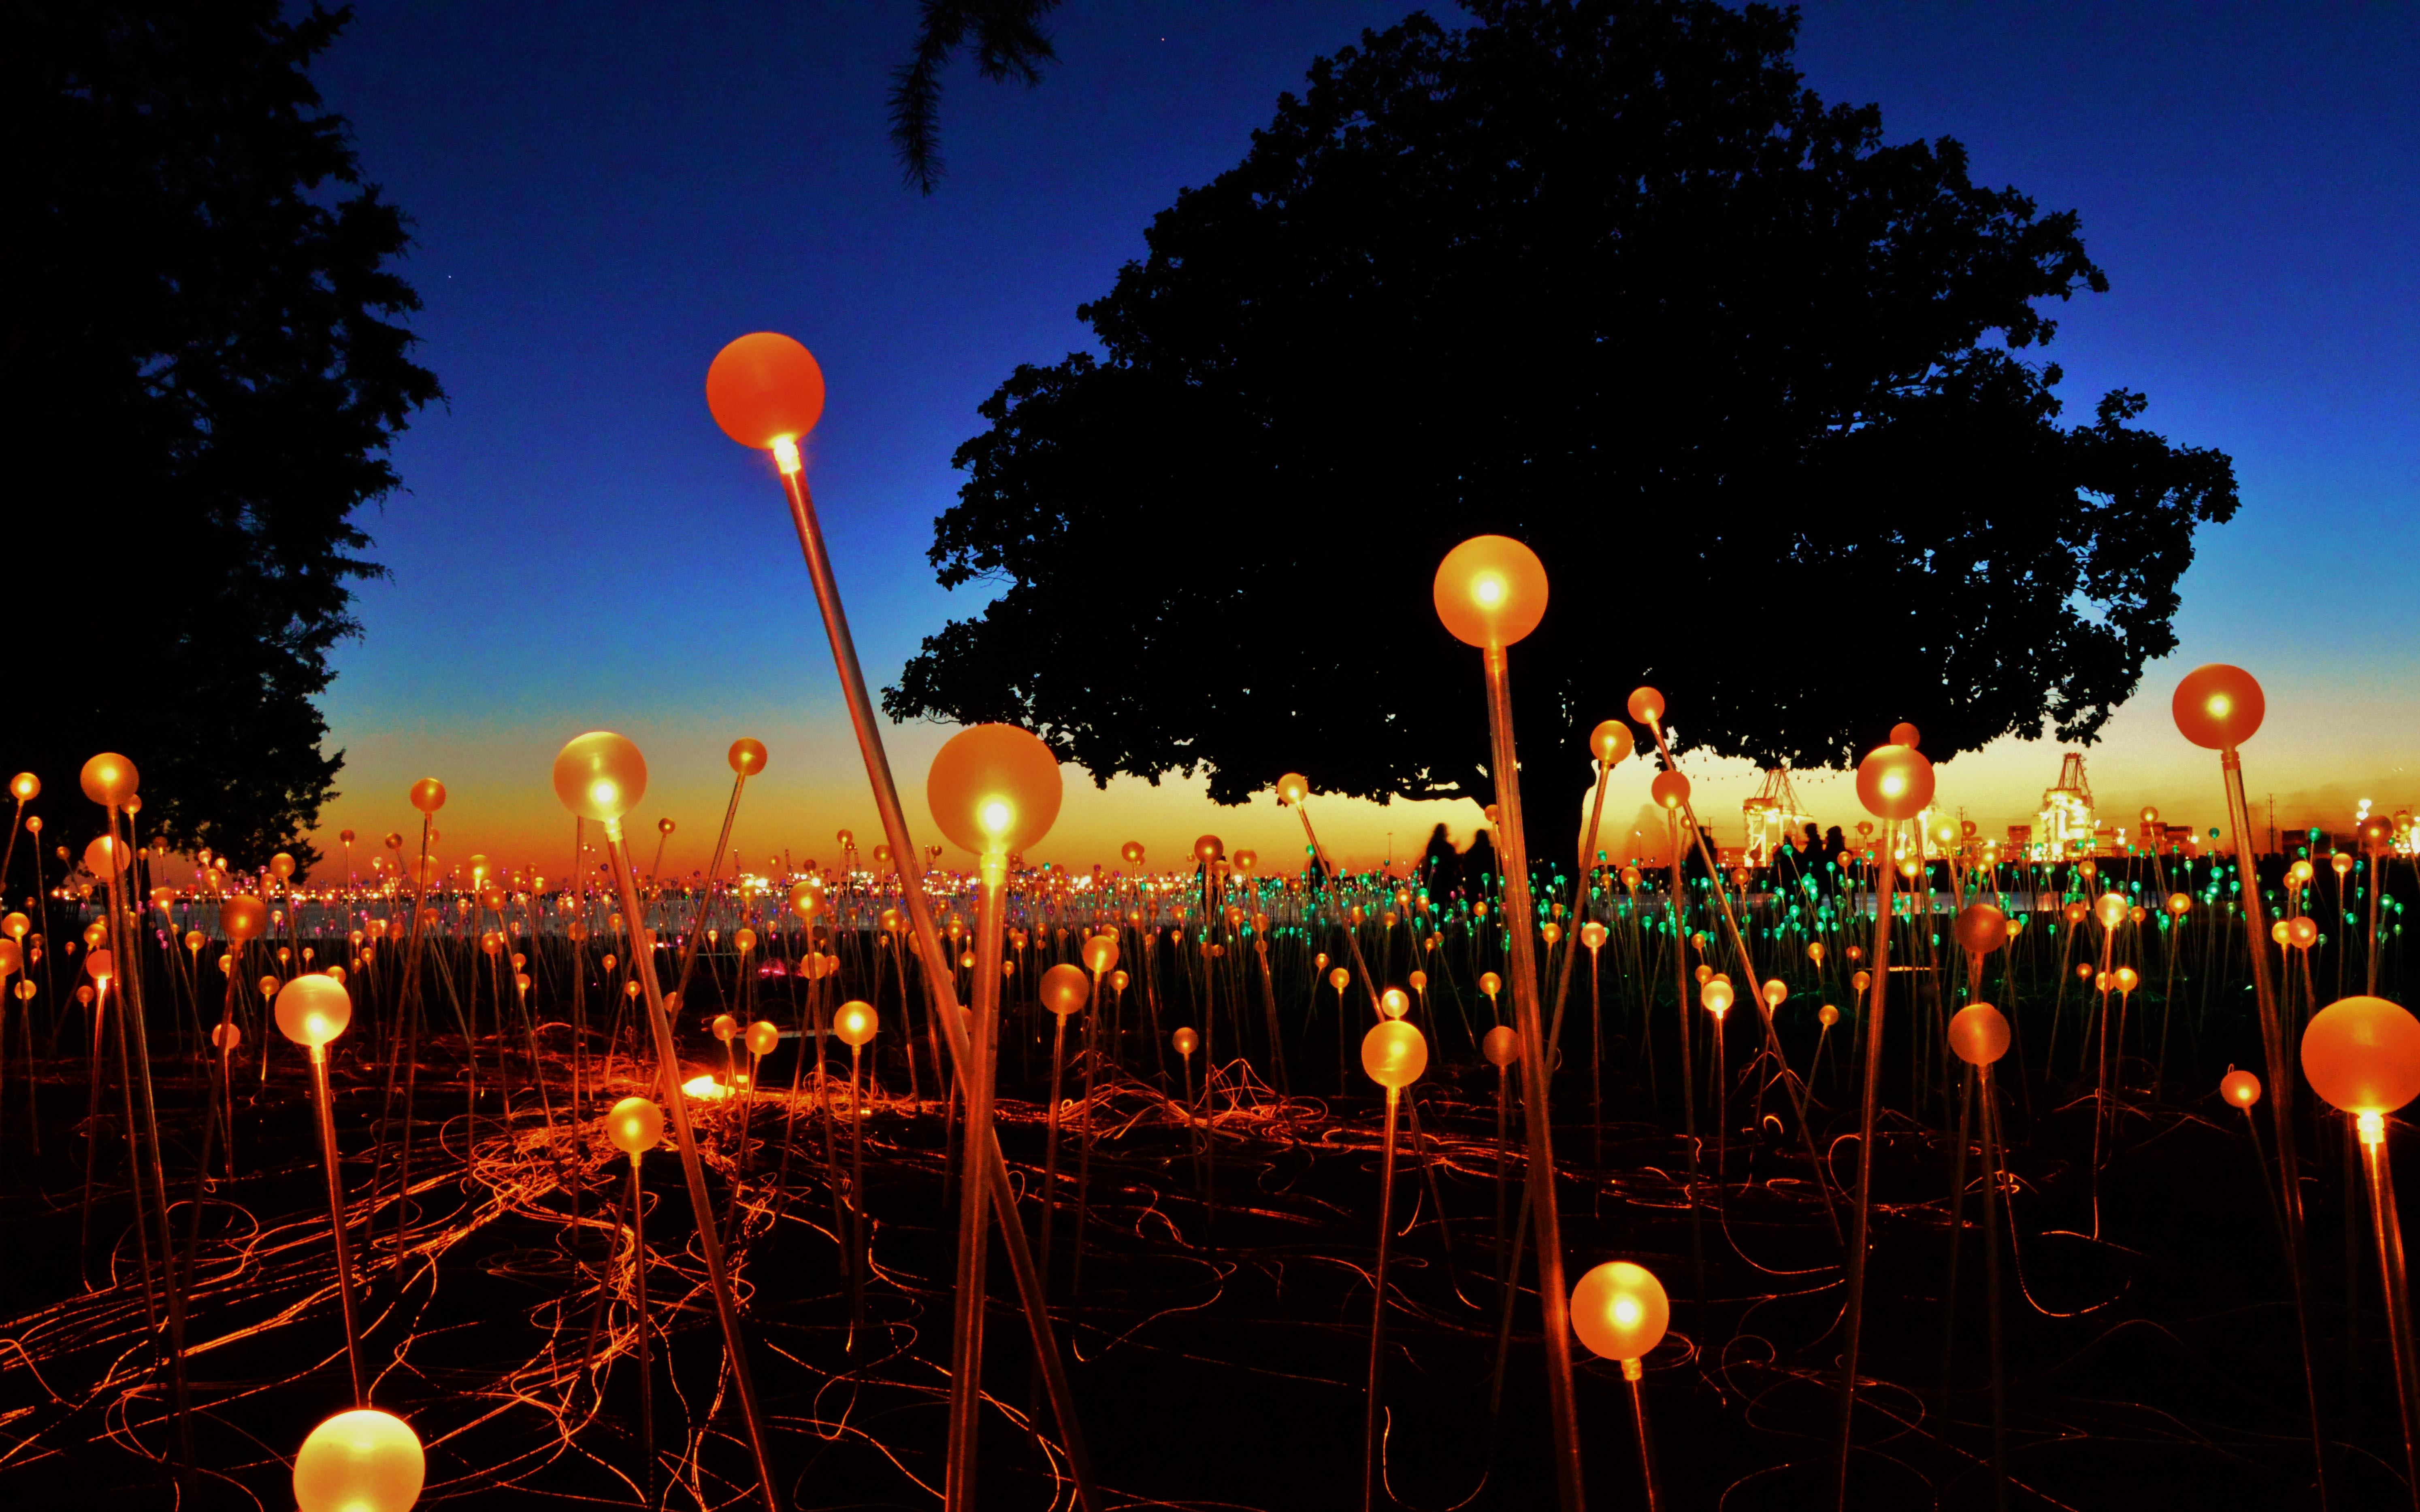 bruce_munro_s__field_of_lights___norfolk__va_by_schaex-d8devrw